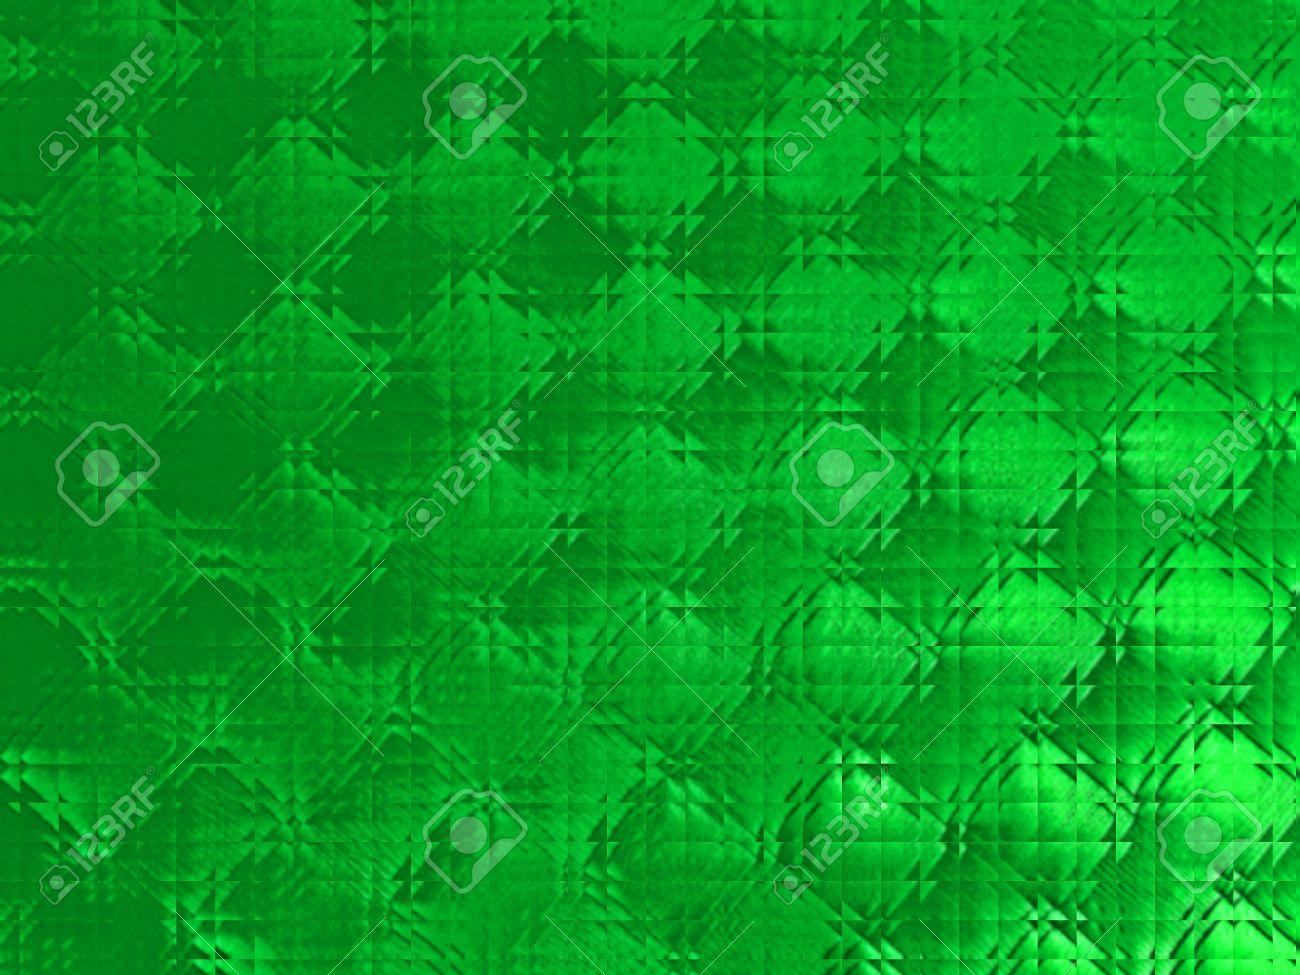 green background emerald texture